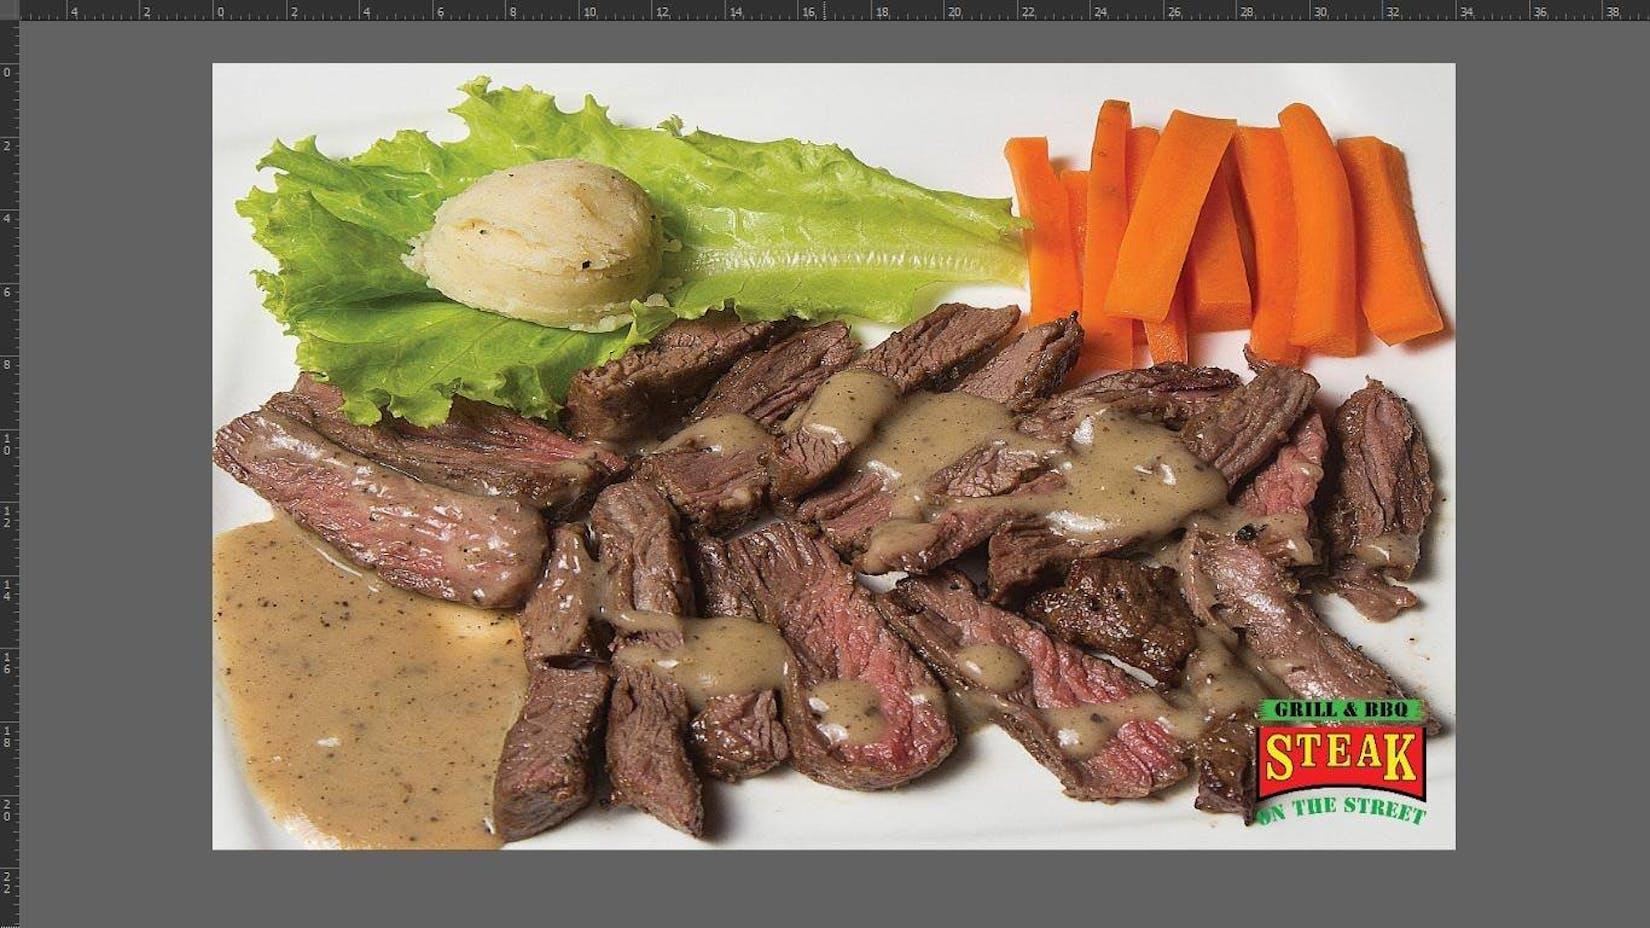 Steak On The Street (2) | yathar